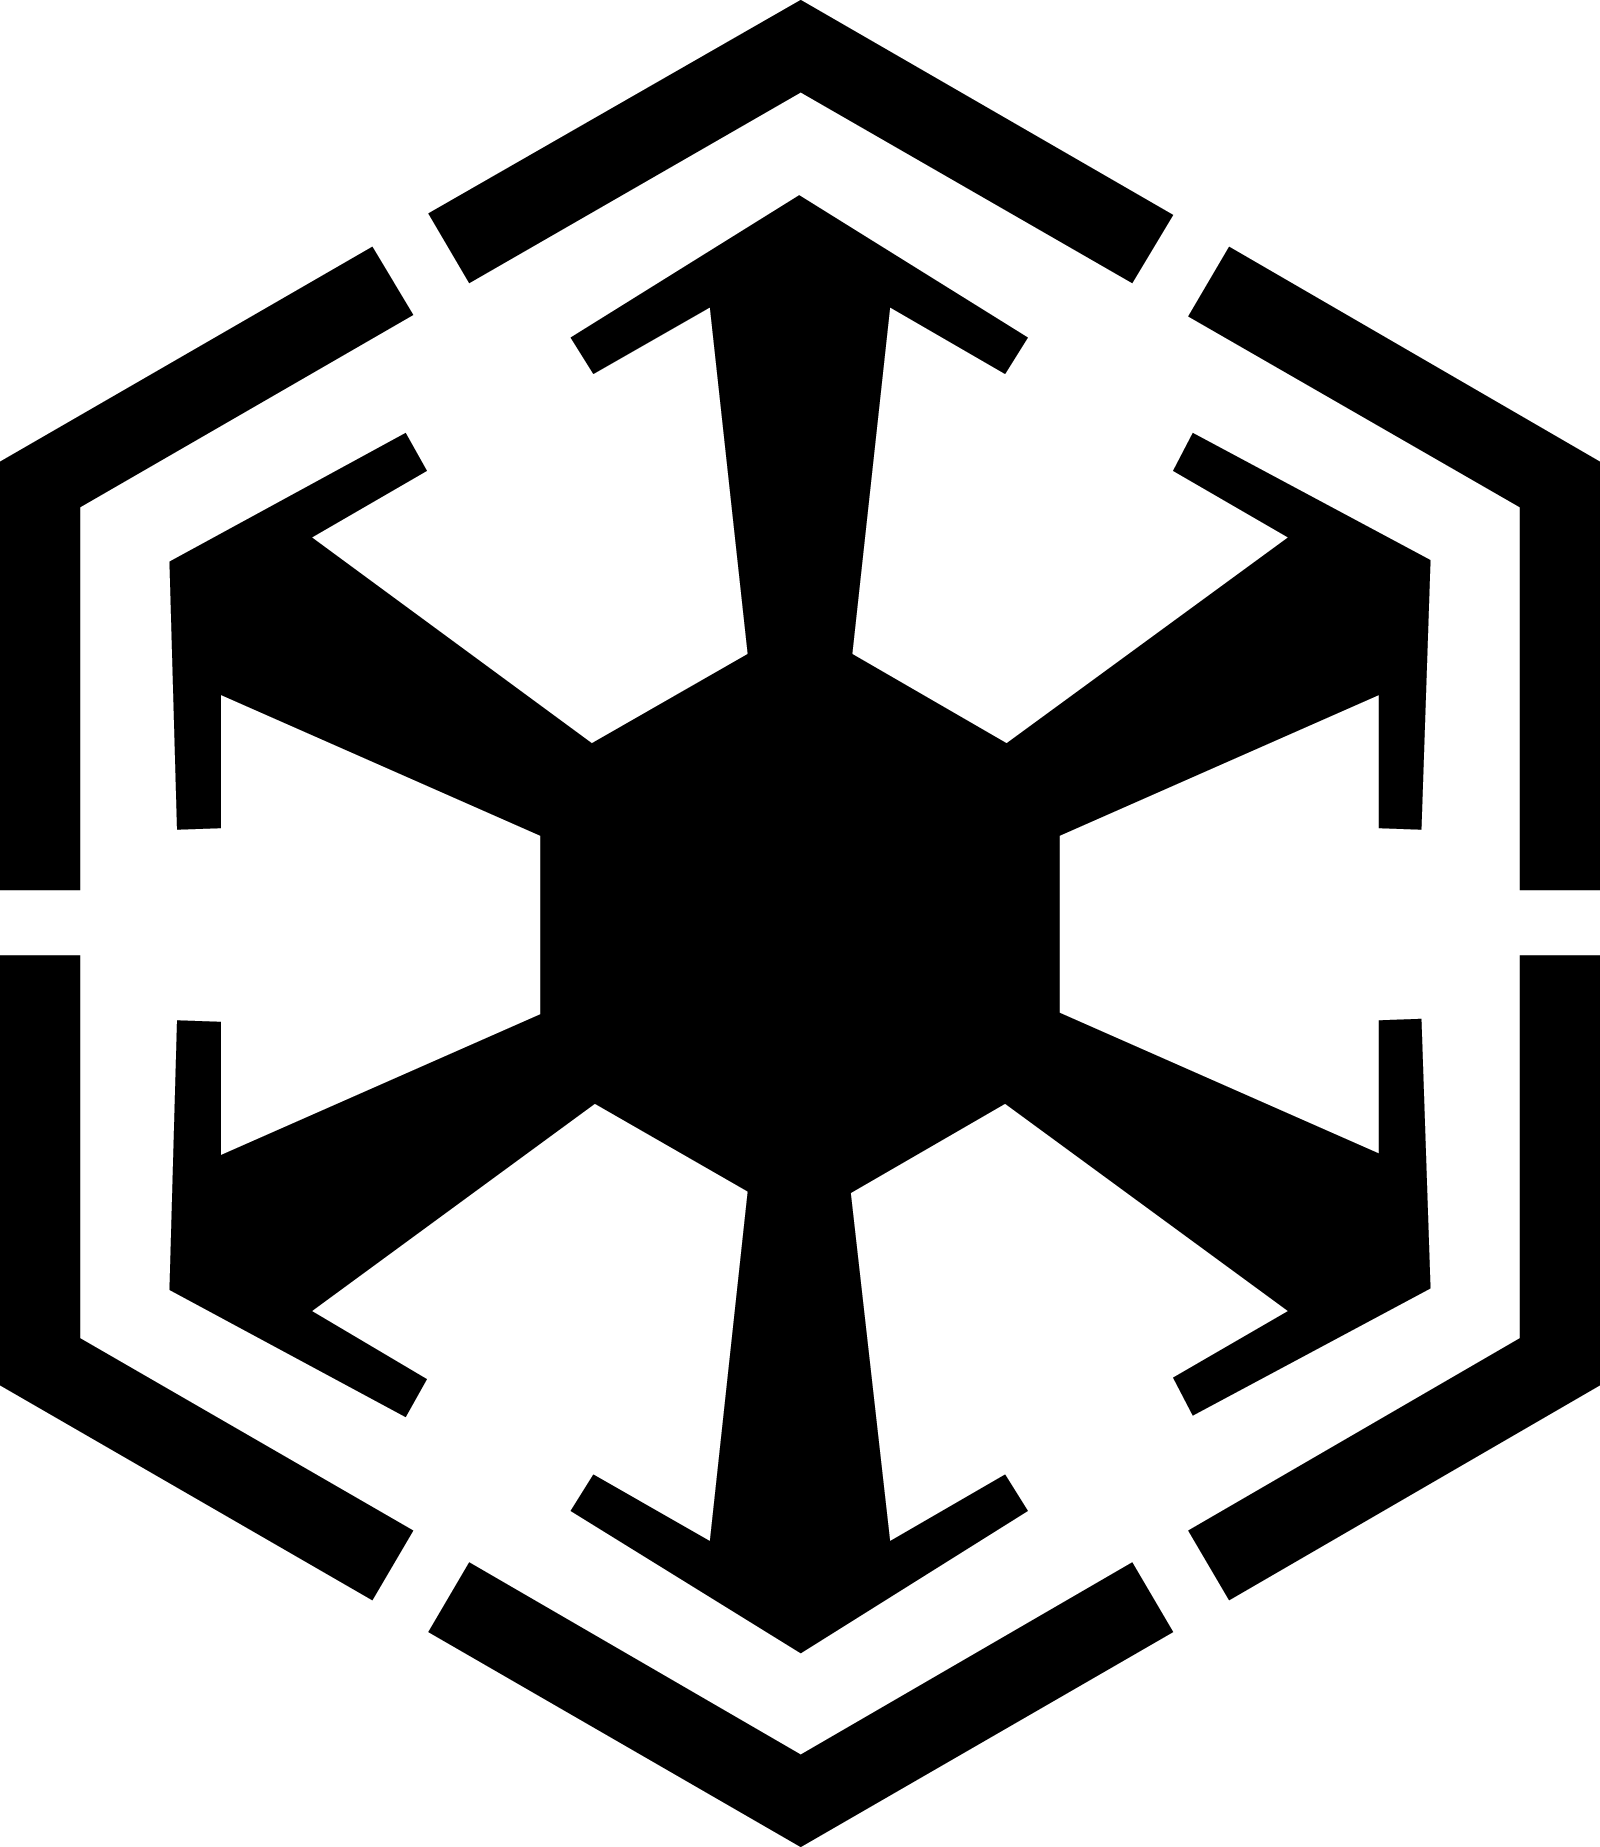 1600x1847 19 Vector Emblem Star Wars Huge Freebie! Download For Powerpoint